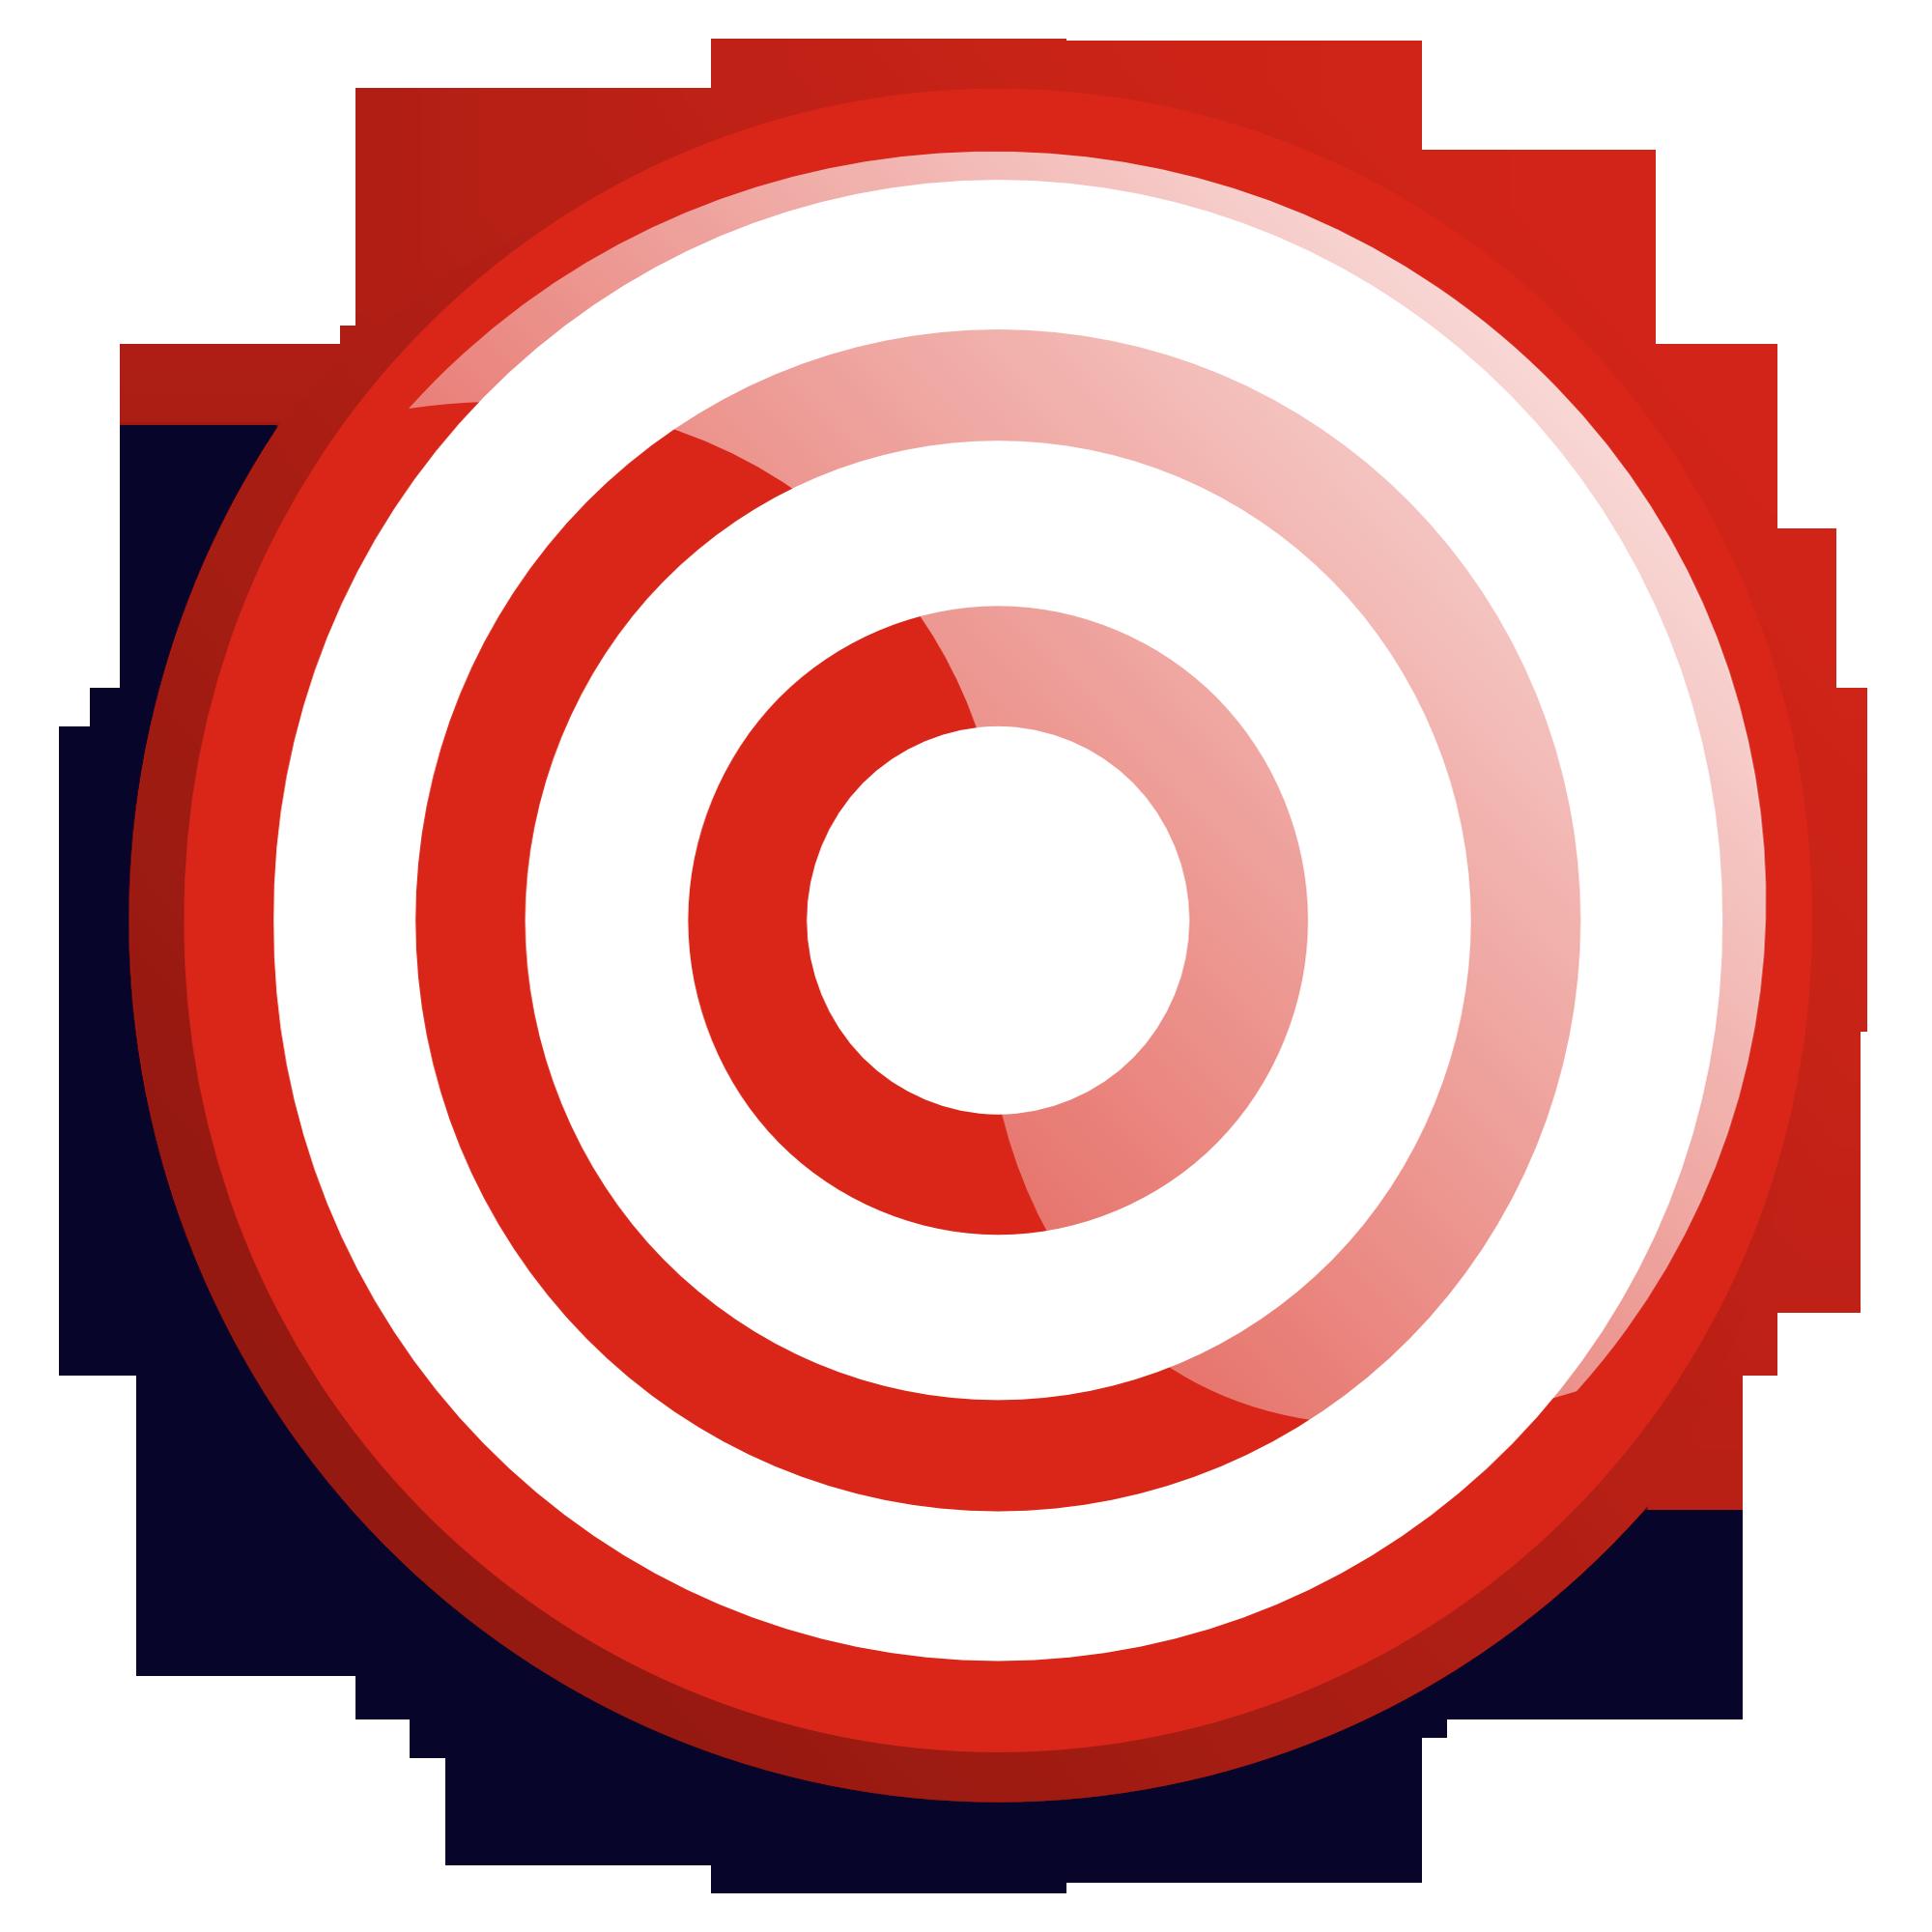 Target PNG images free download